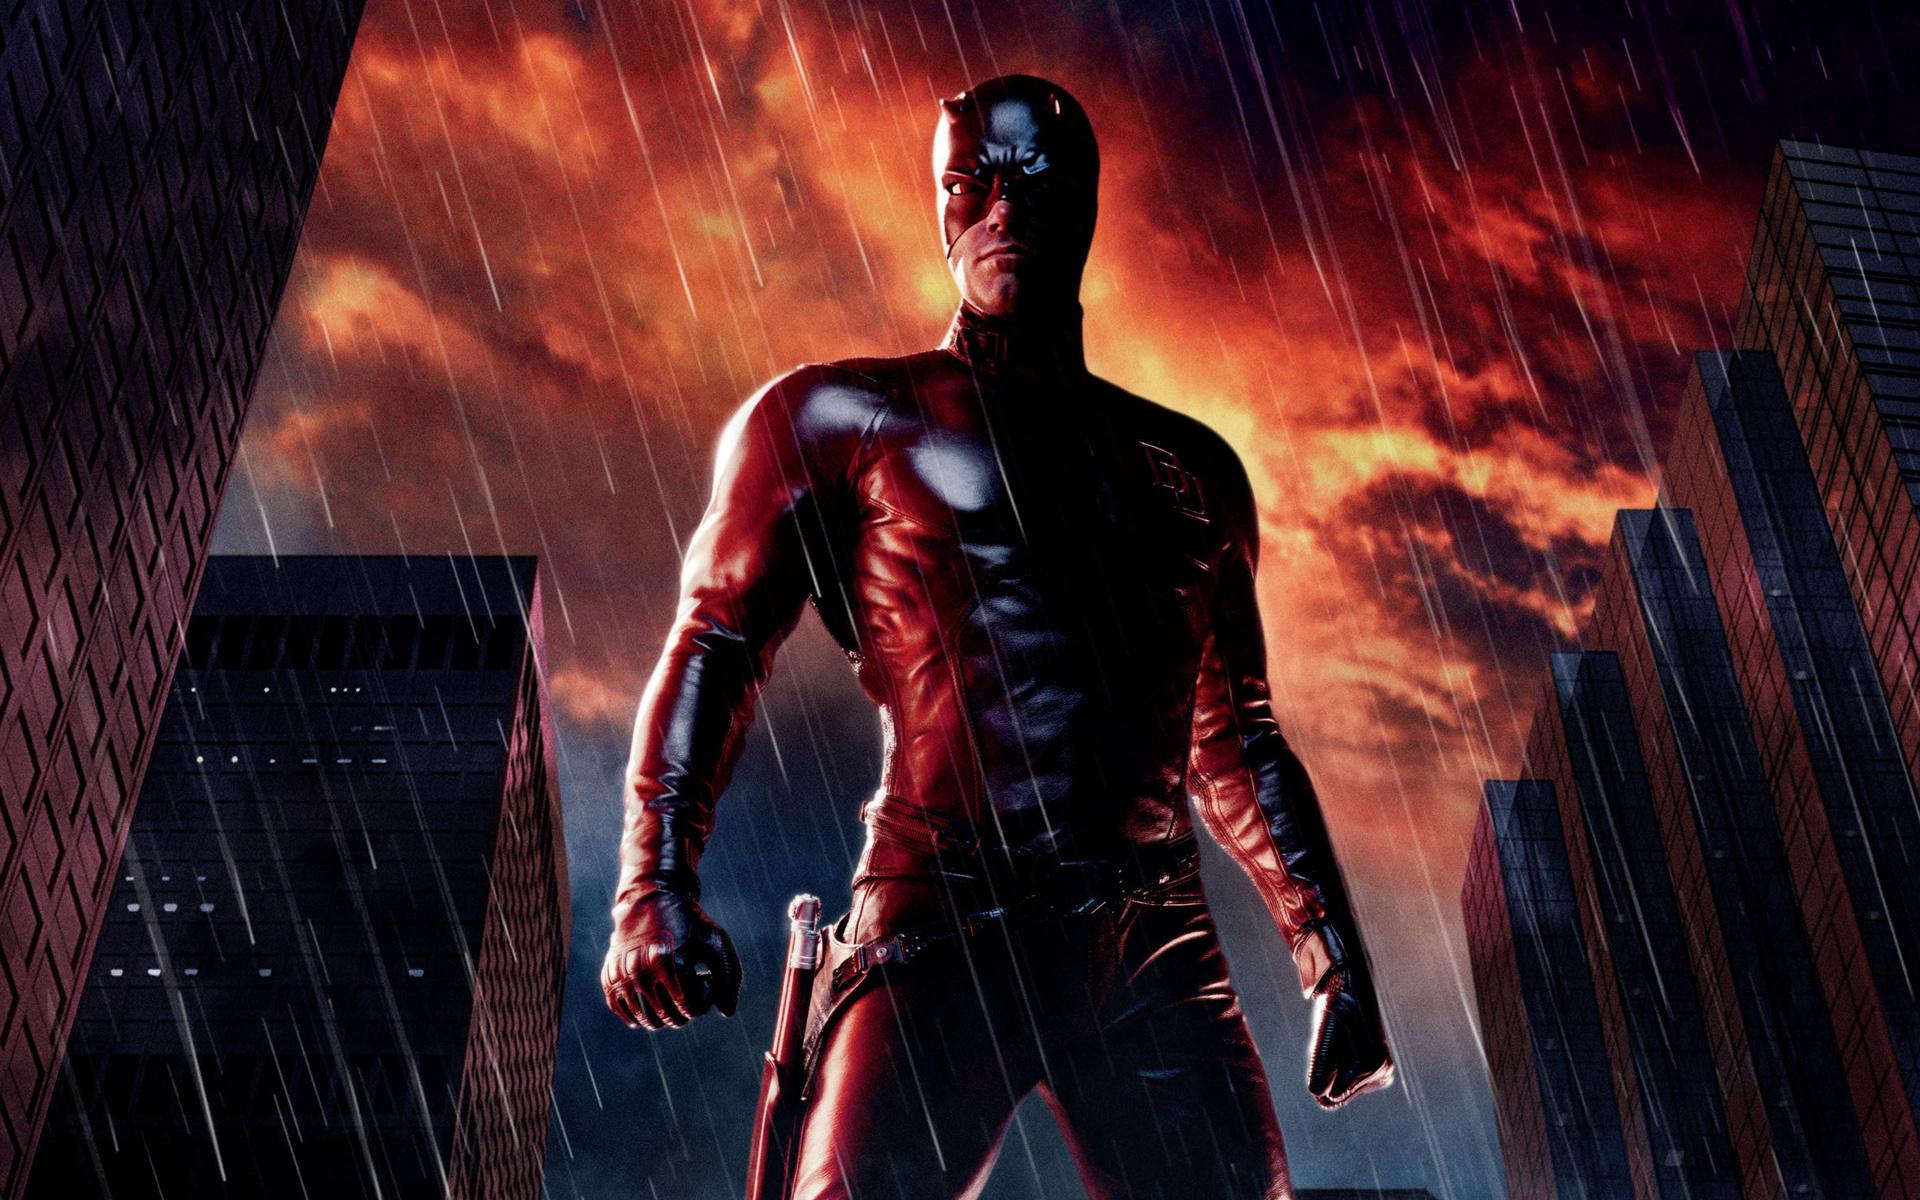 HD Wallpapers Daredevil